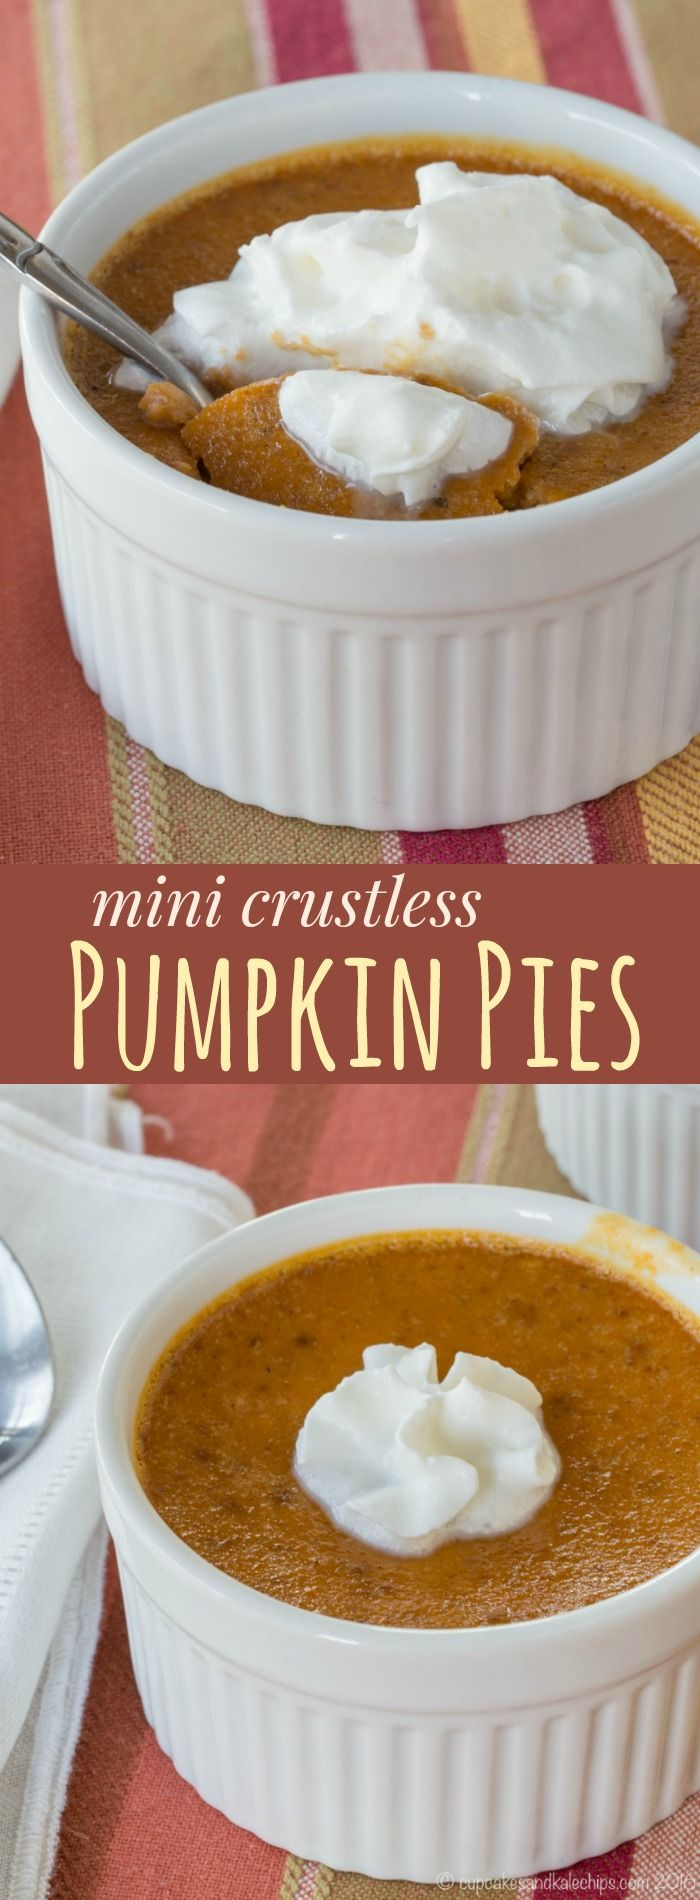 Mini Crustless Pumpkin Pies - an individual pumpkin pie recipe that's naturally gluten free